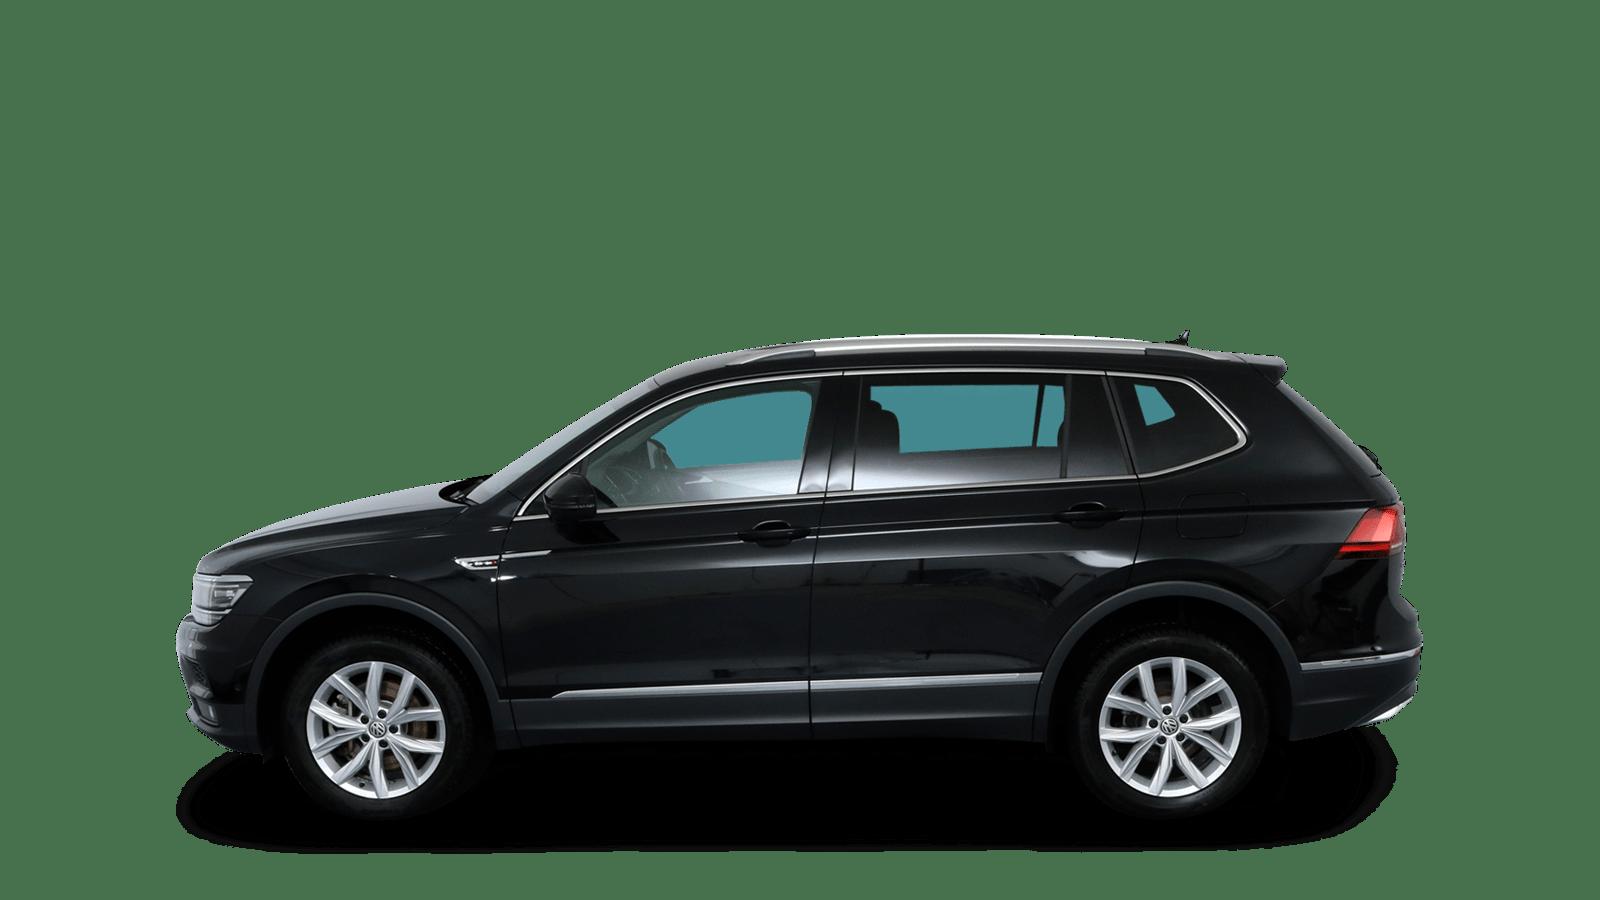 VW Tiguan Allspace Black back - Clyde car subscription